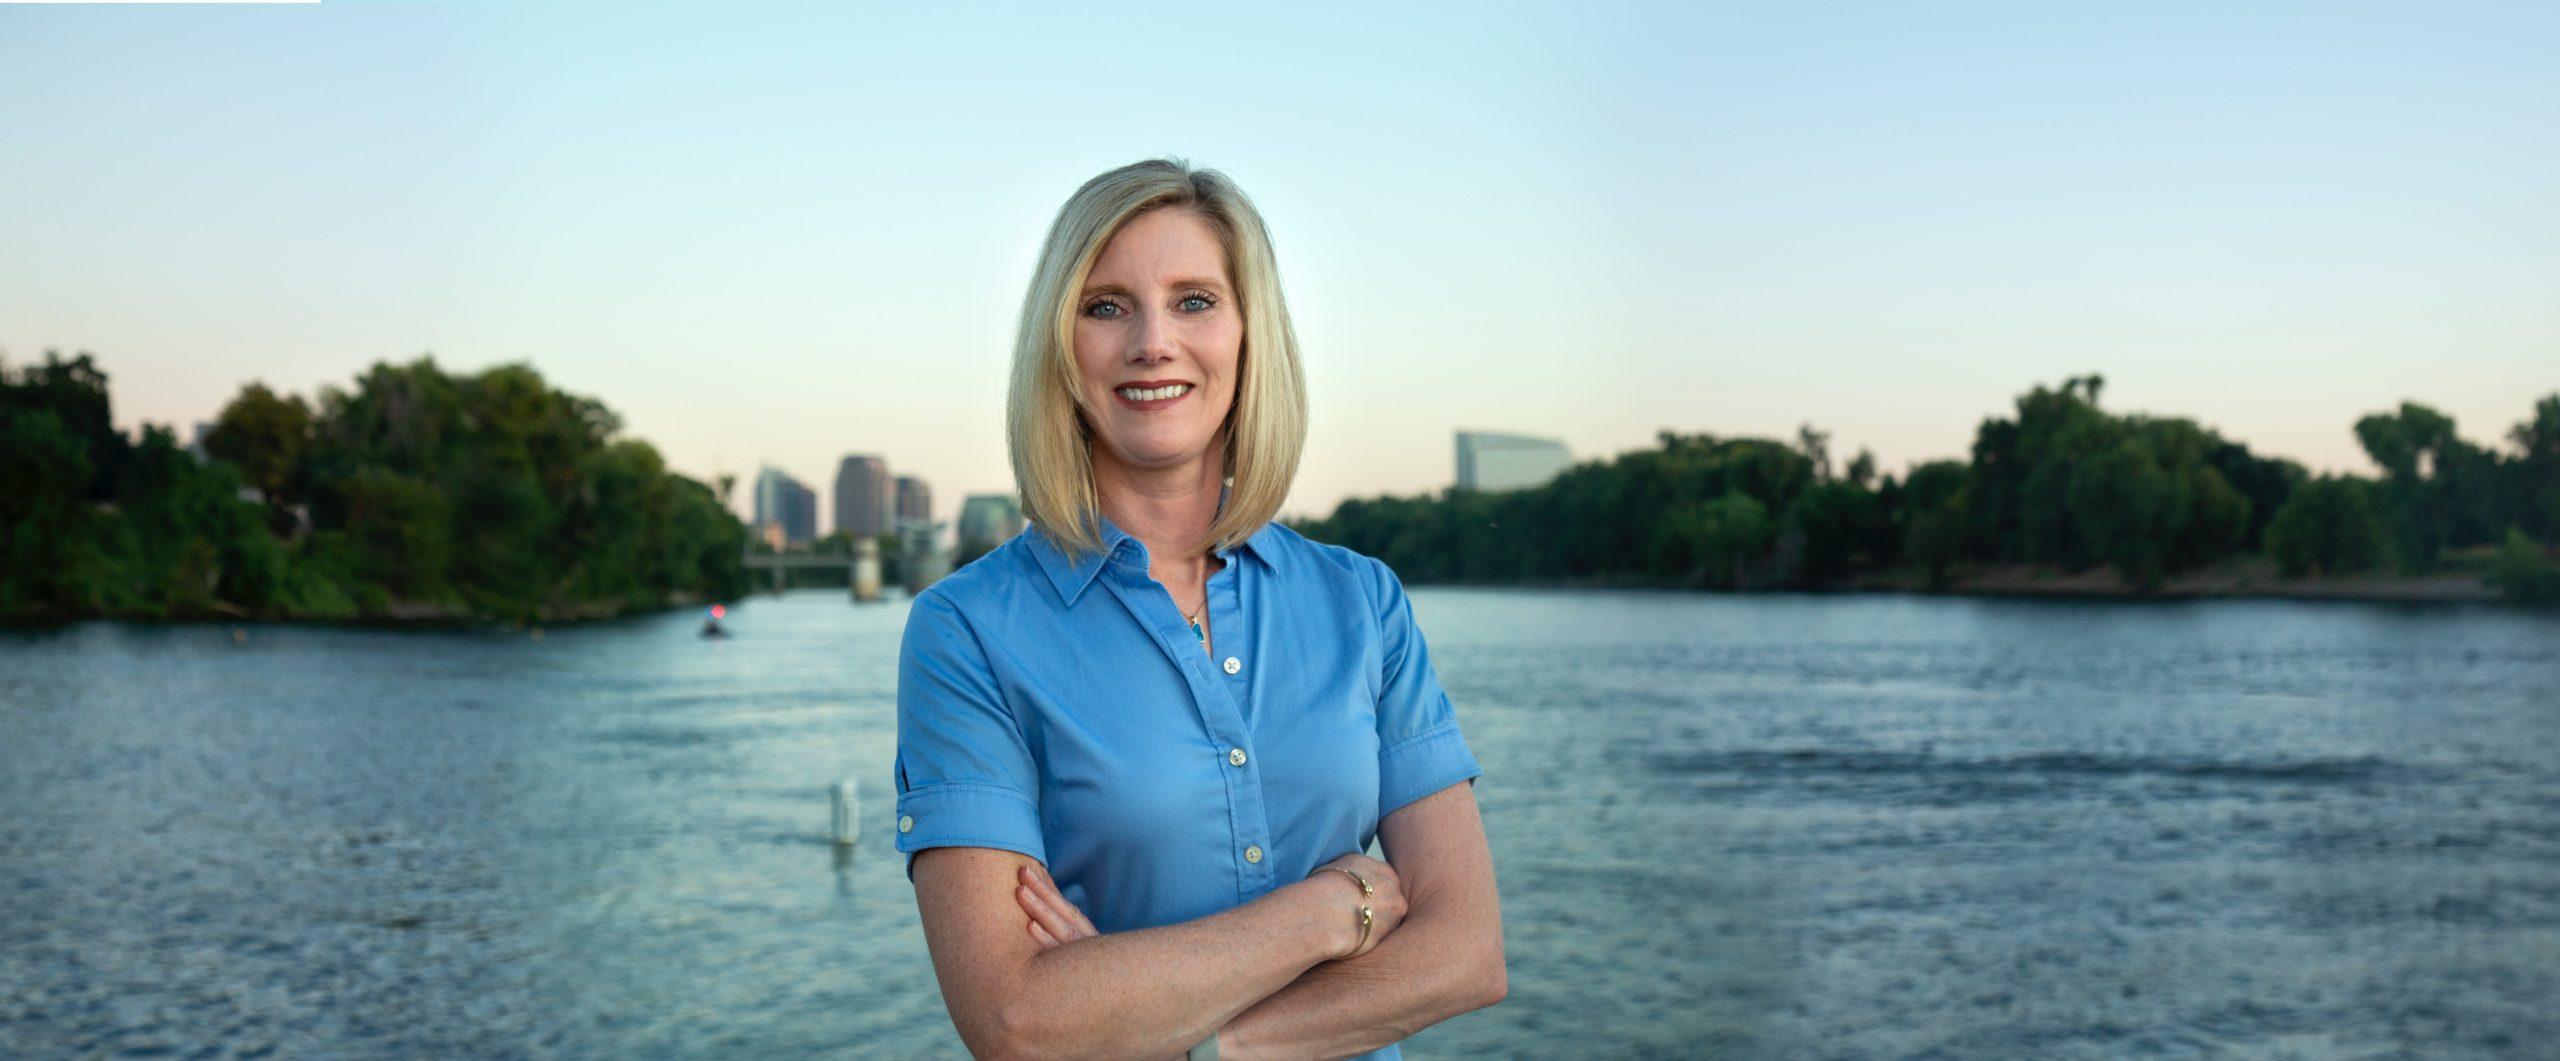 Jenna Abbott, Executive Director of The River District PBID